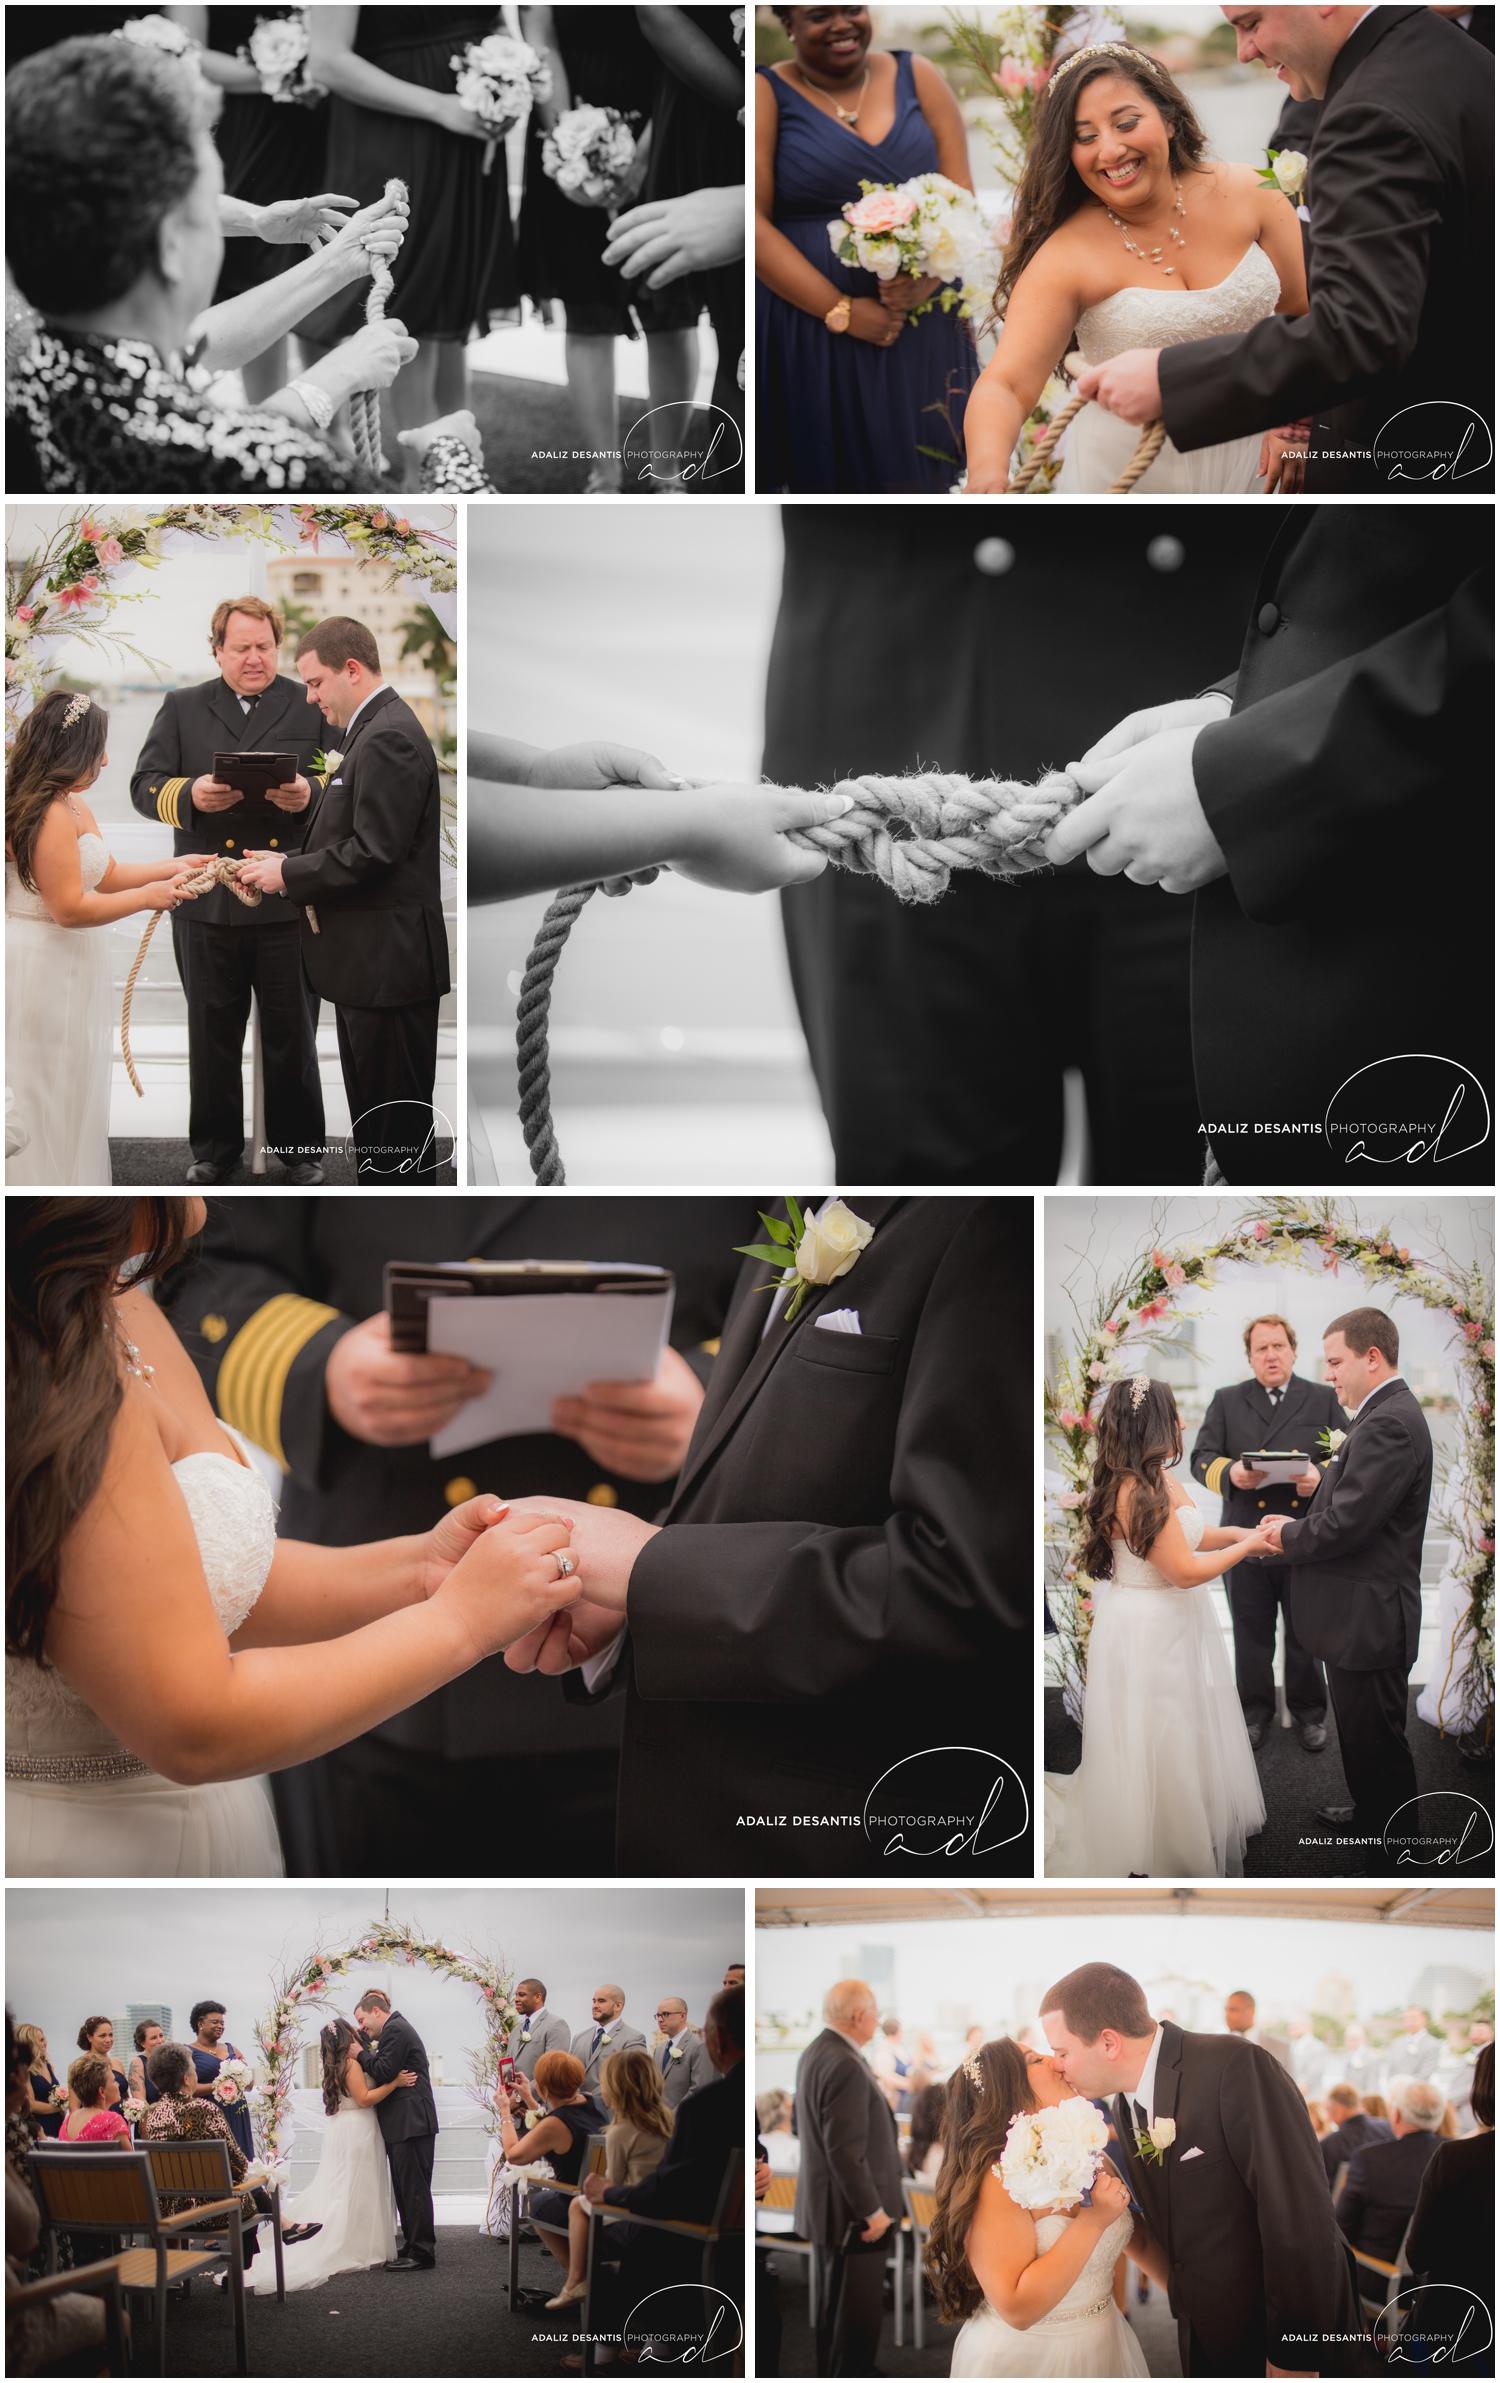 Taylor and amanda Indiana Fort Lauderdale Sun Dream yacht charter wedding 12